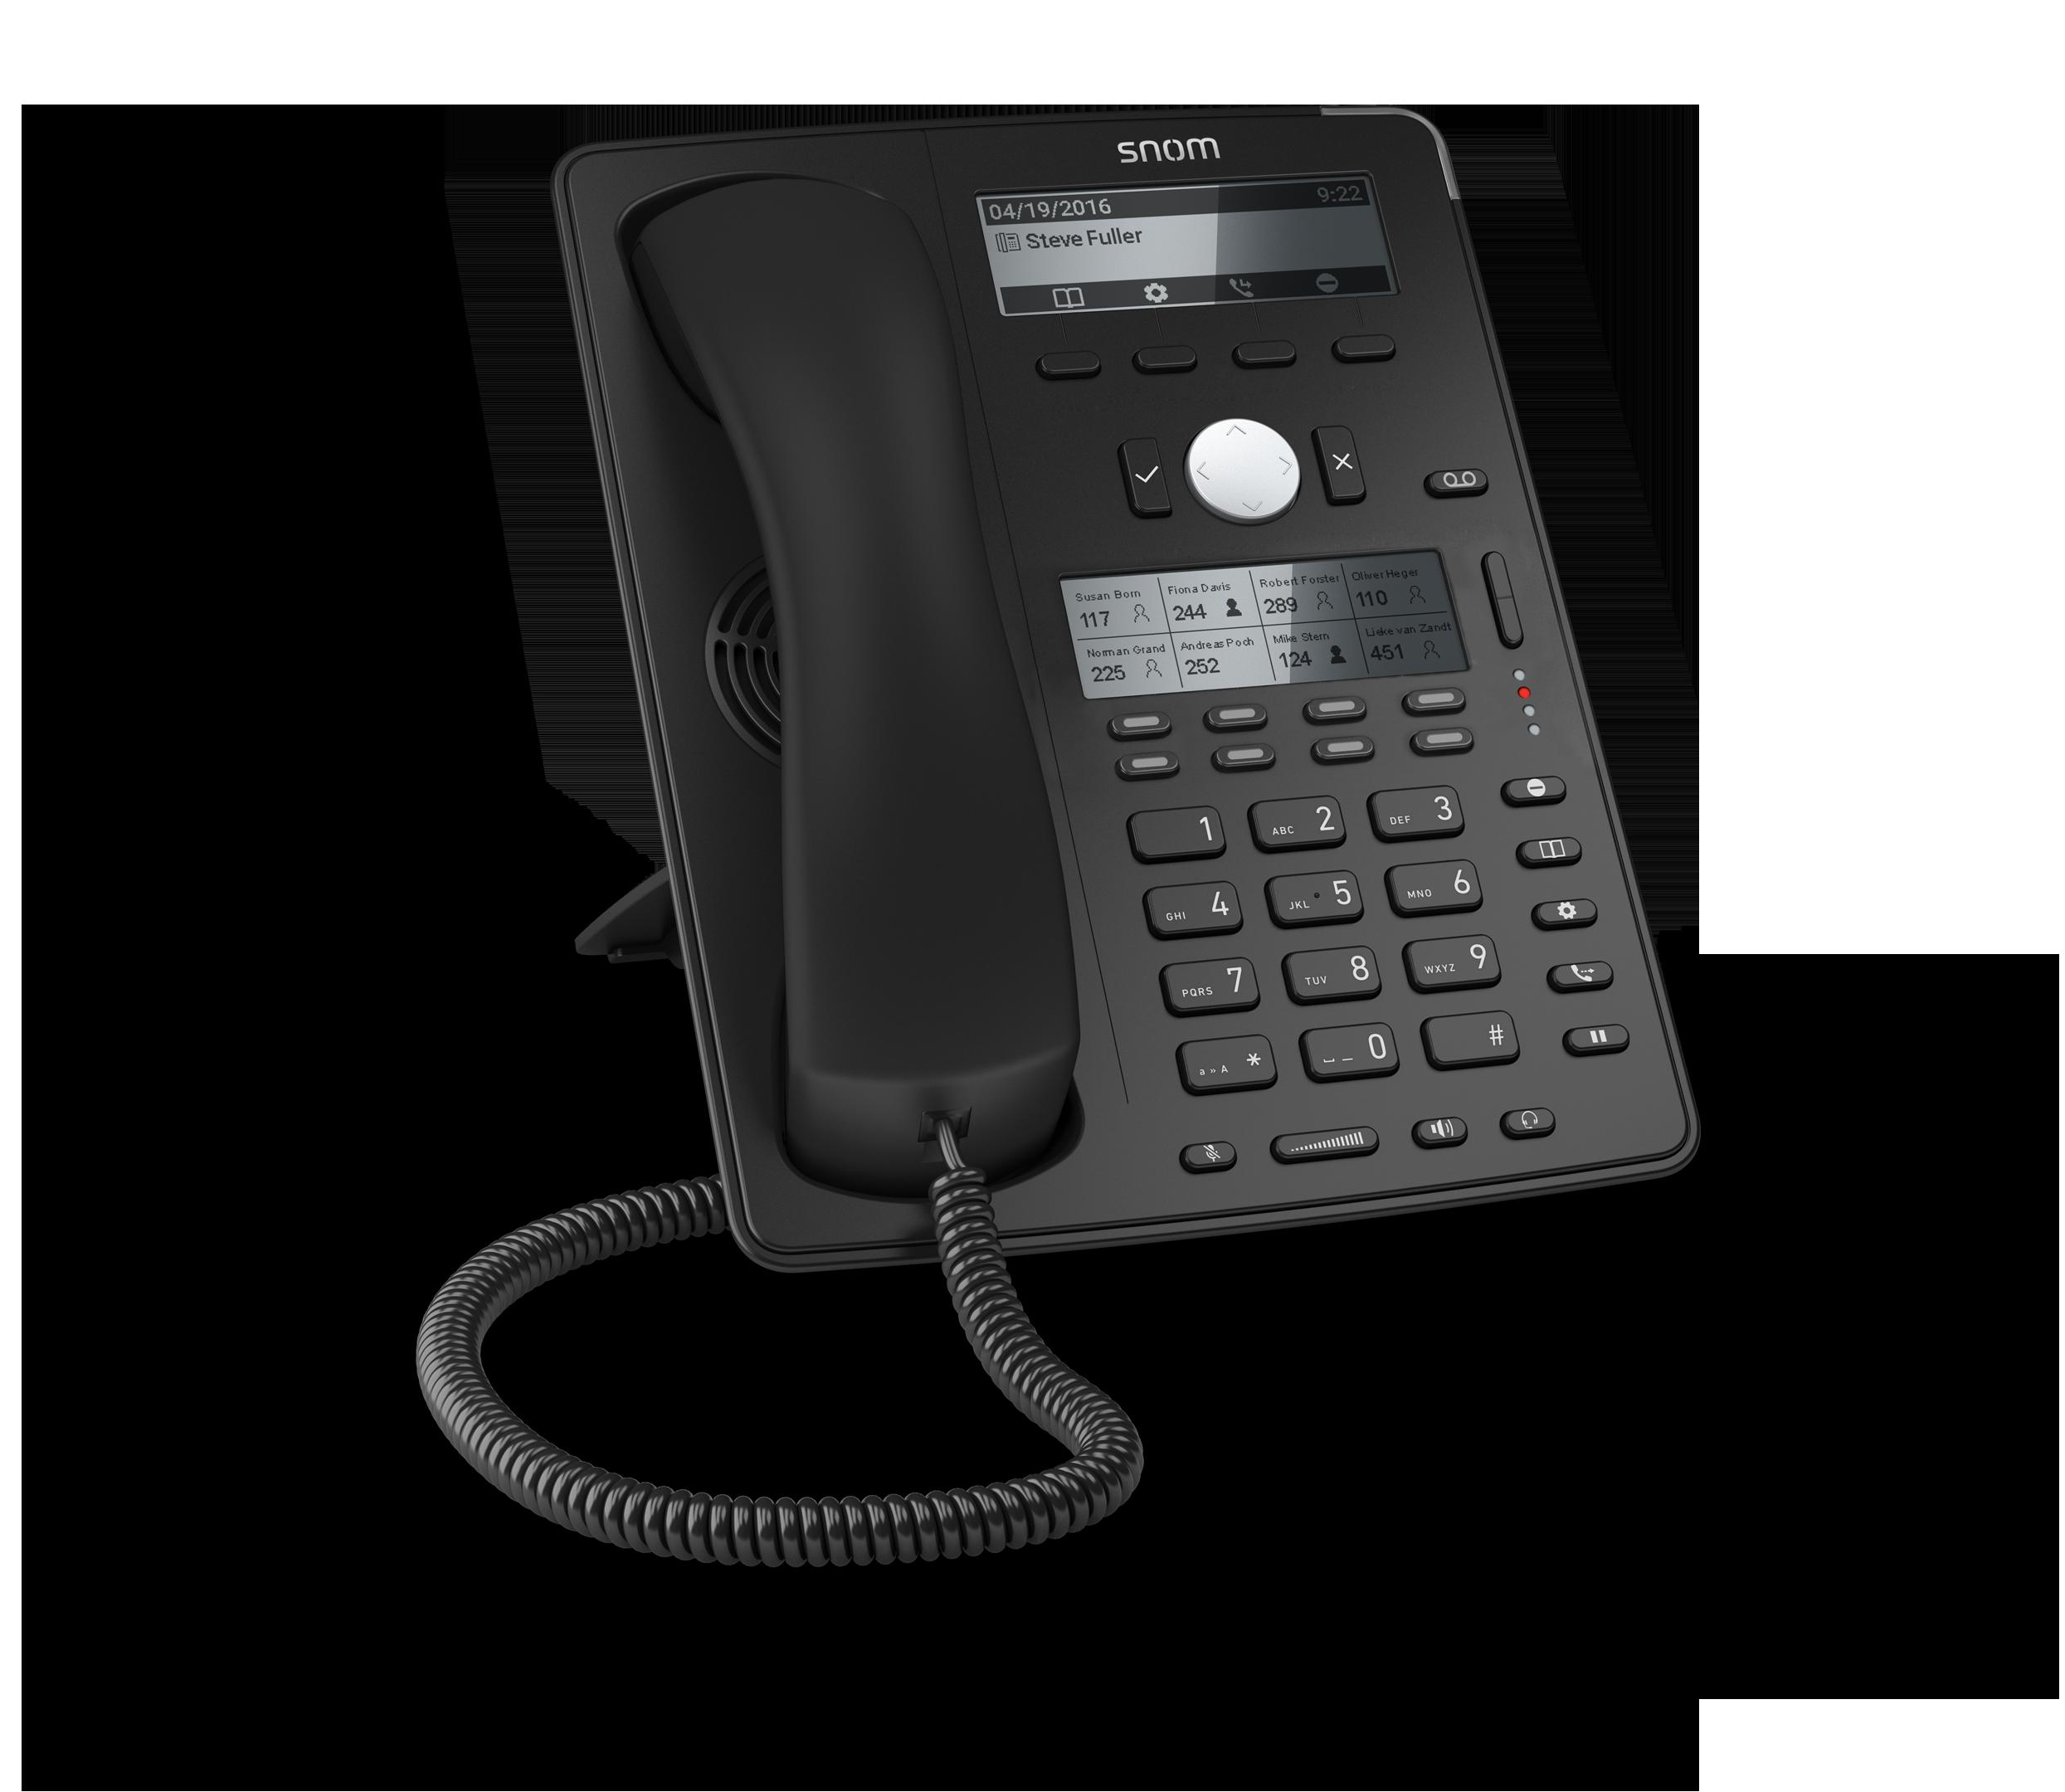 SNOM D745 IP tel., PoE, dual LCD, 8 (32) prog. tl., GigE